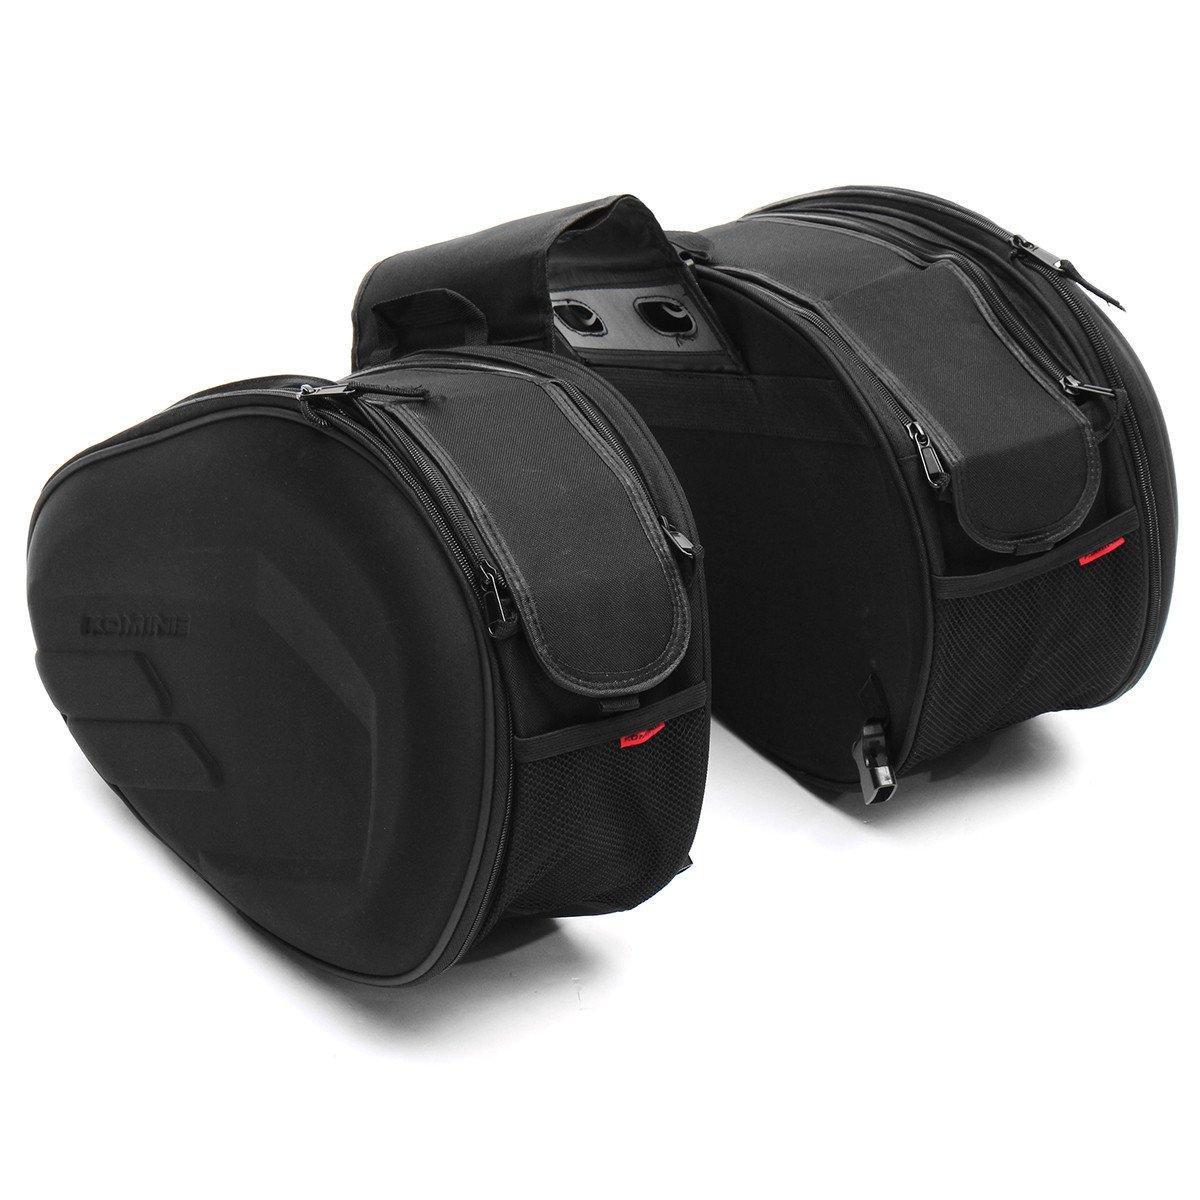 CoCocina 36L-58L Large Capacity Luggage Saddle Bag Motorcycle Rear Seat Multi-Use Expandable